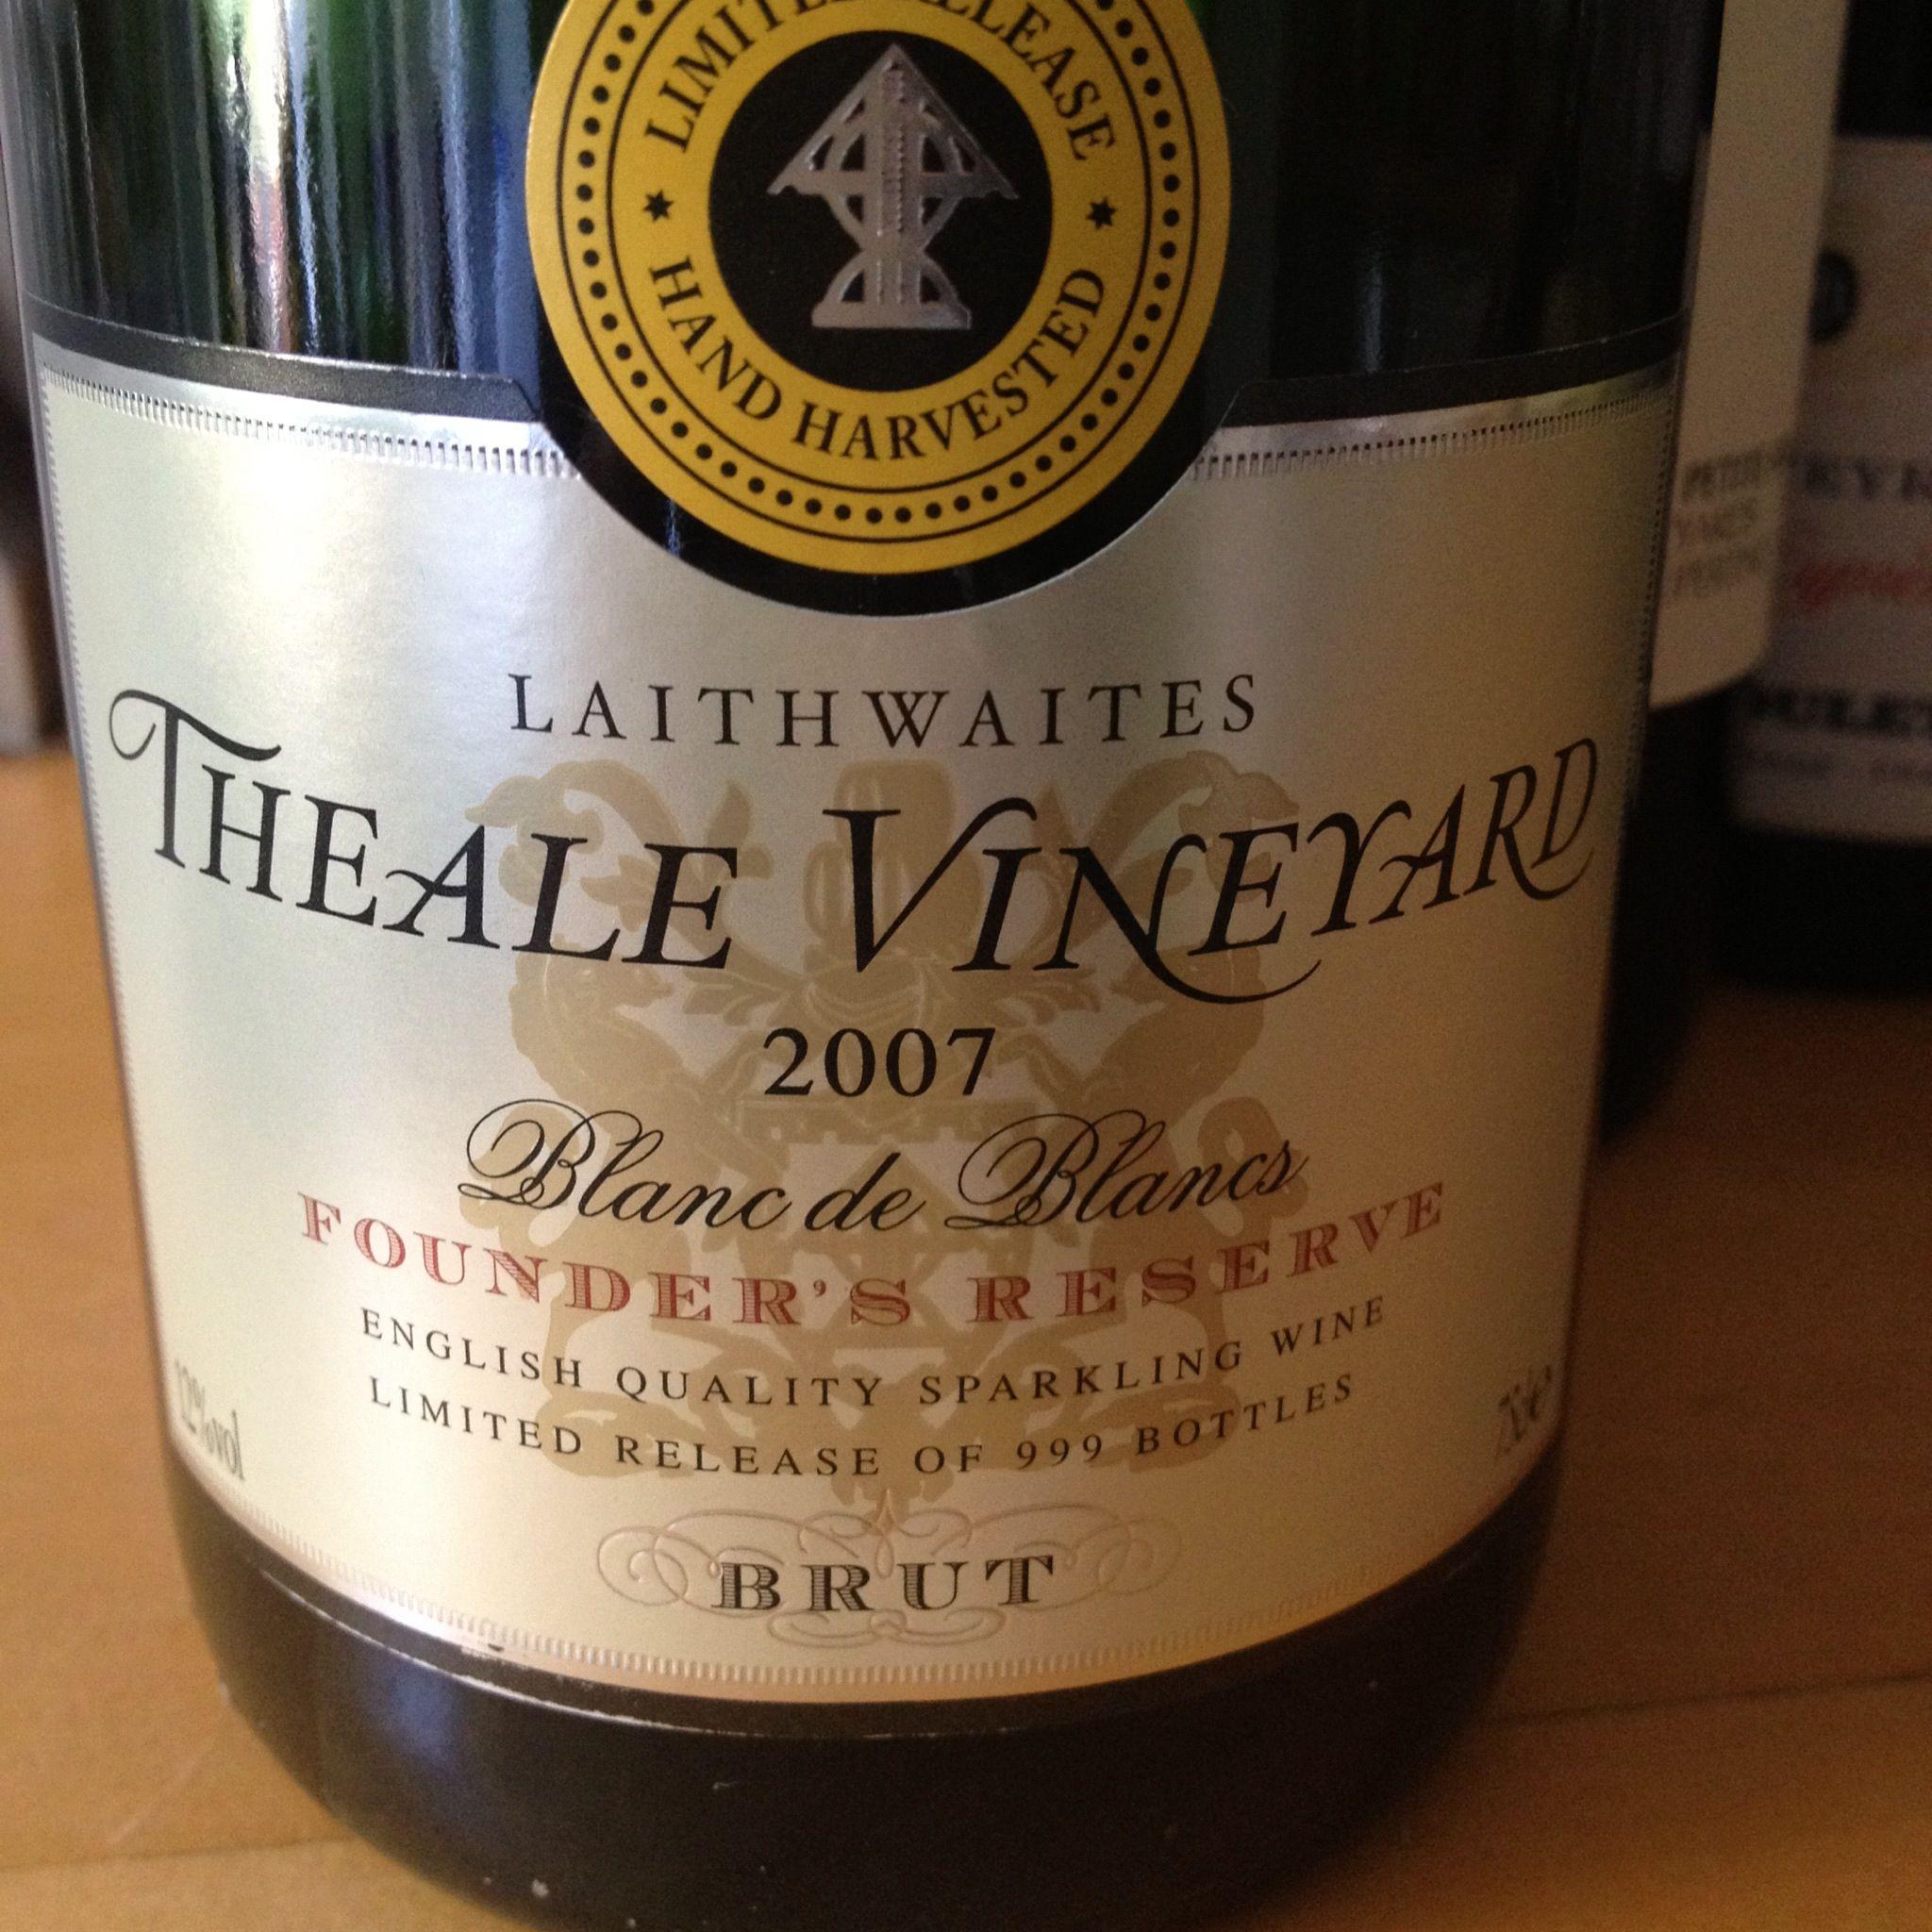 Sparkling From Uk Laitwaites Good Wine Bottle Bottle Theale